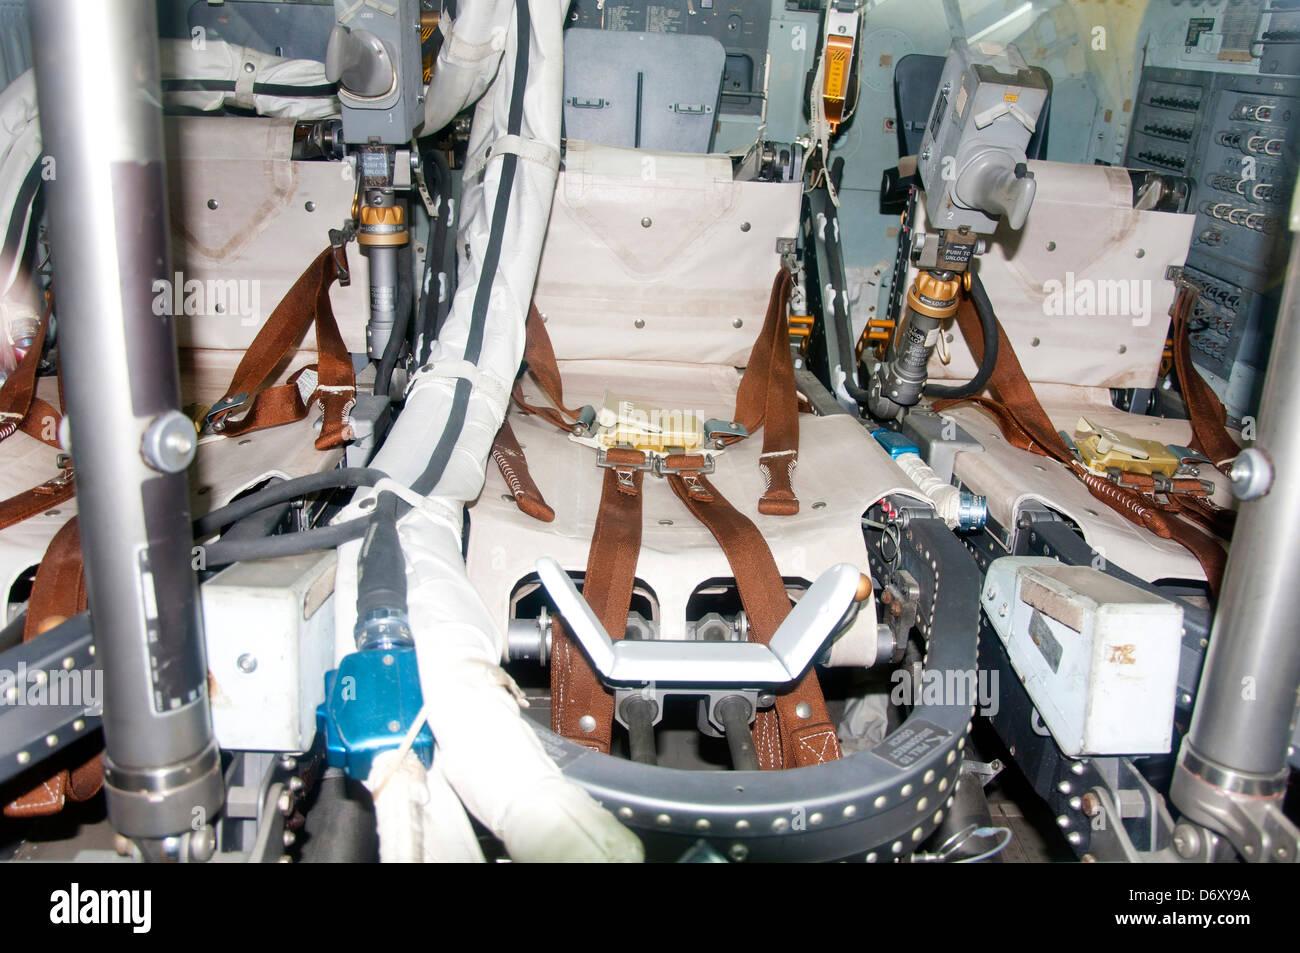 Apollo Command Module Space Capsule Interior, California Science Center in Los Angeles. - Stock Image